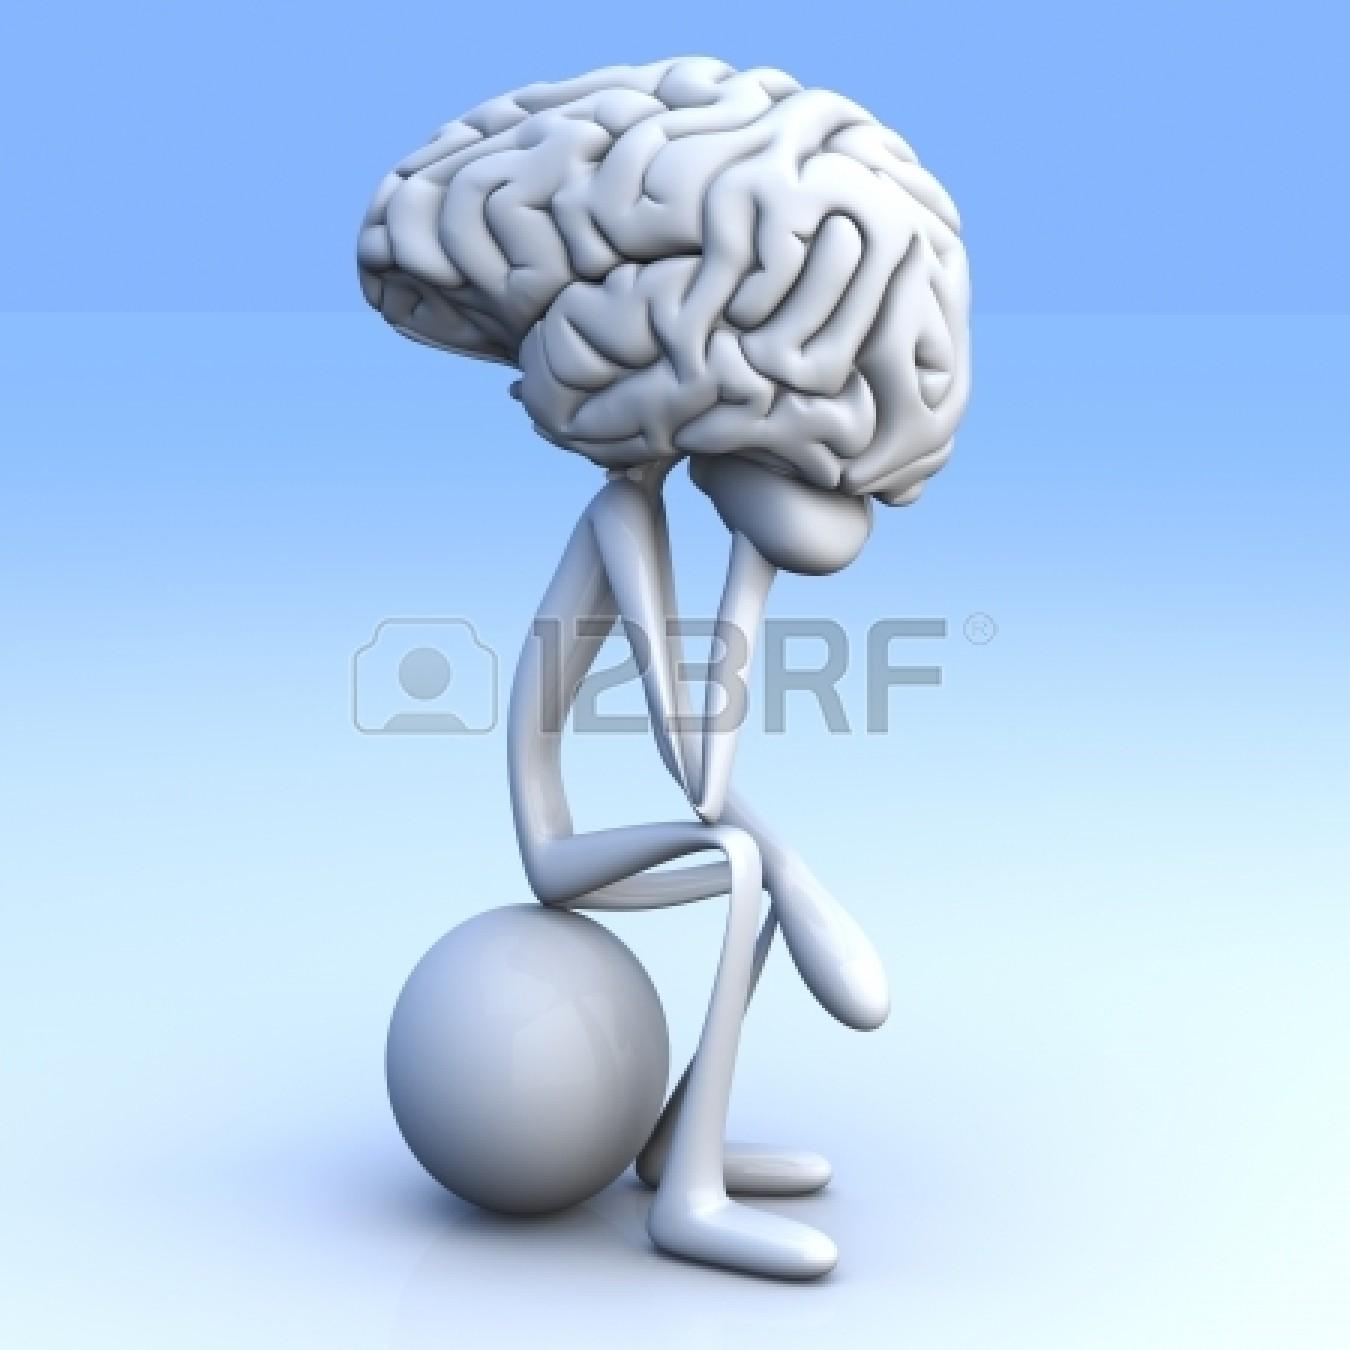 16065553-a-cartoon-figure-con-a-huge-brain-3d-rendered-illustration